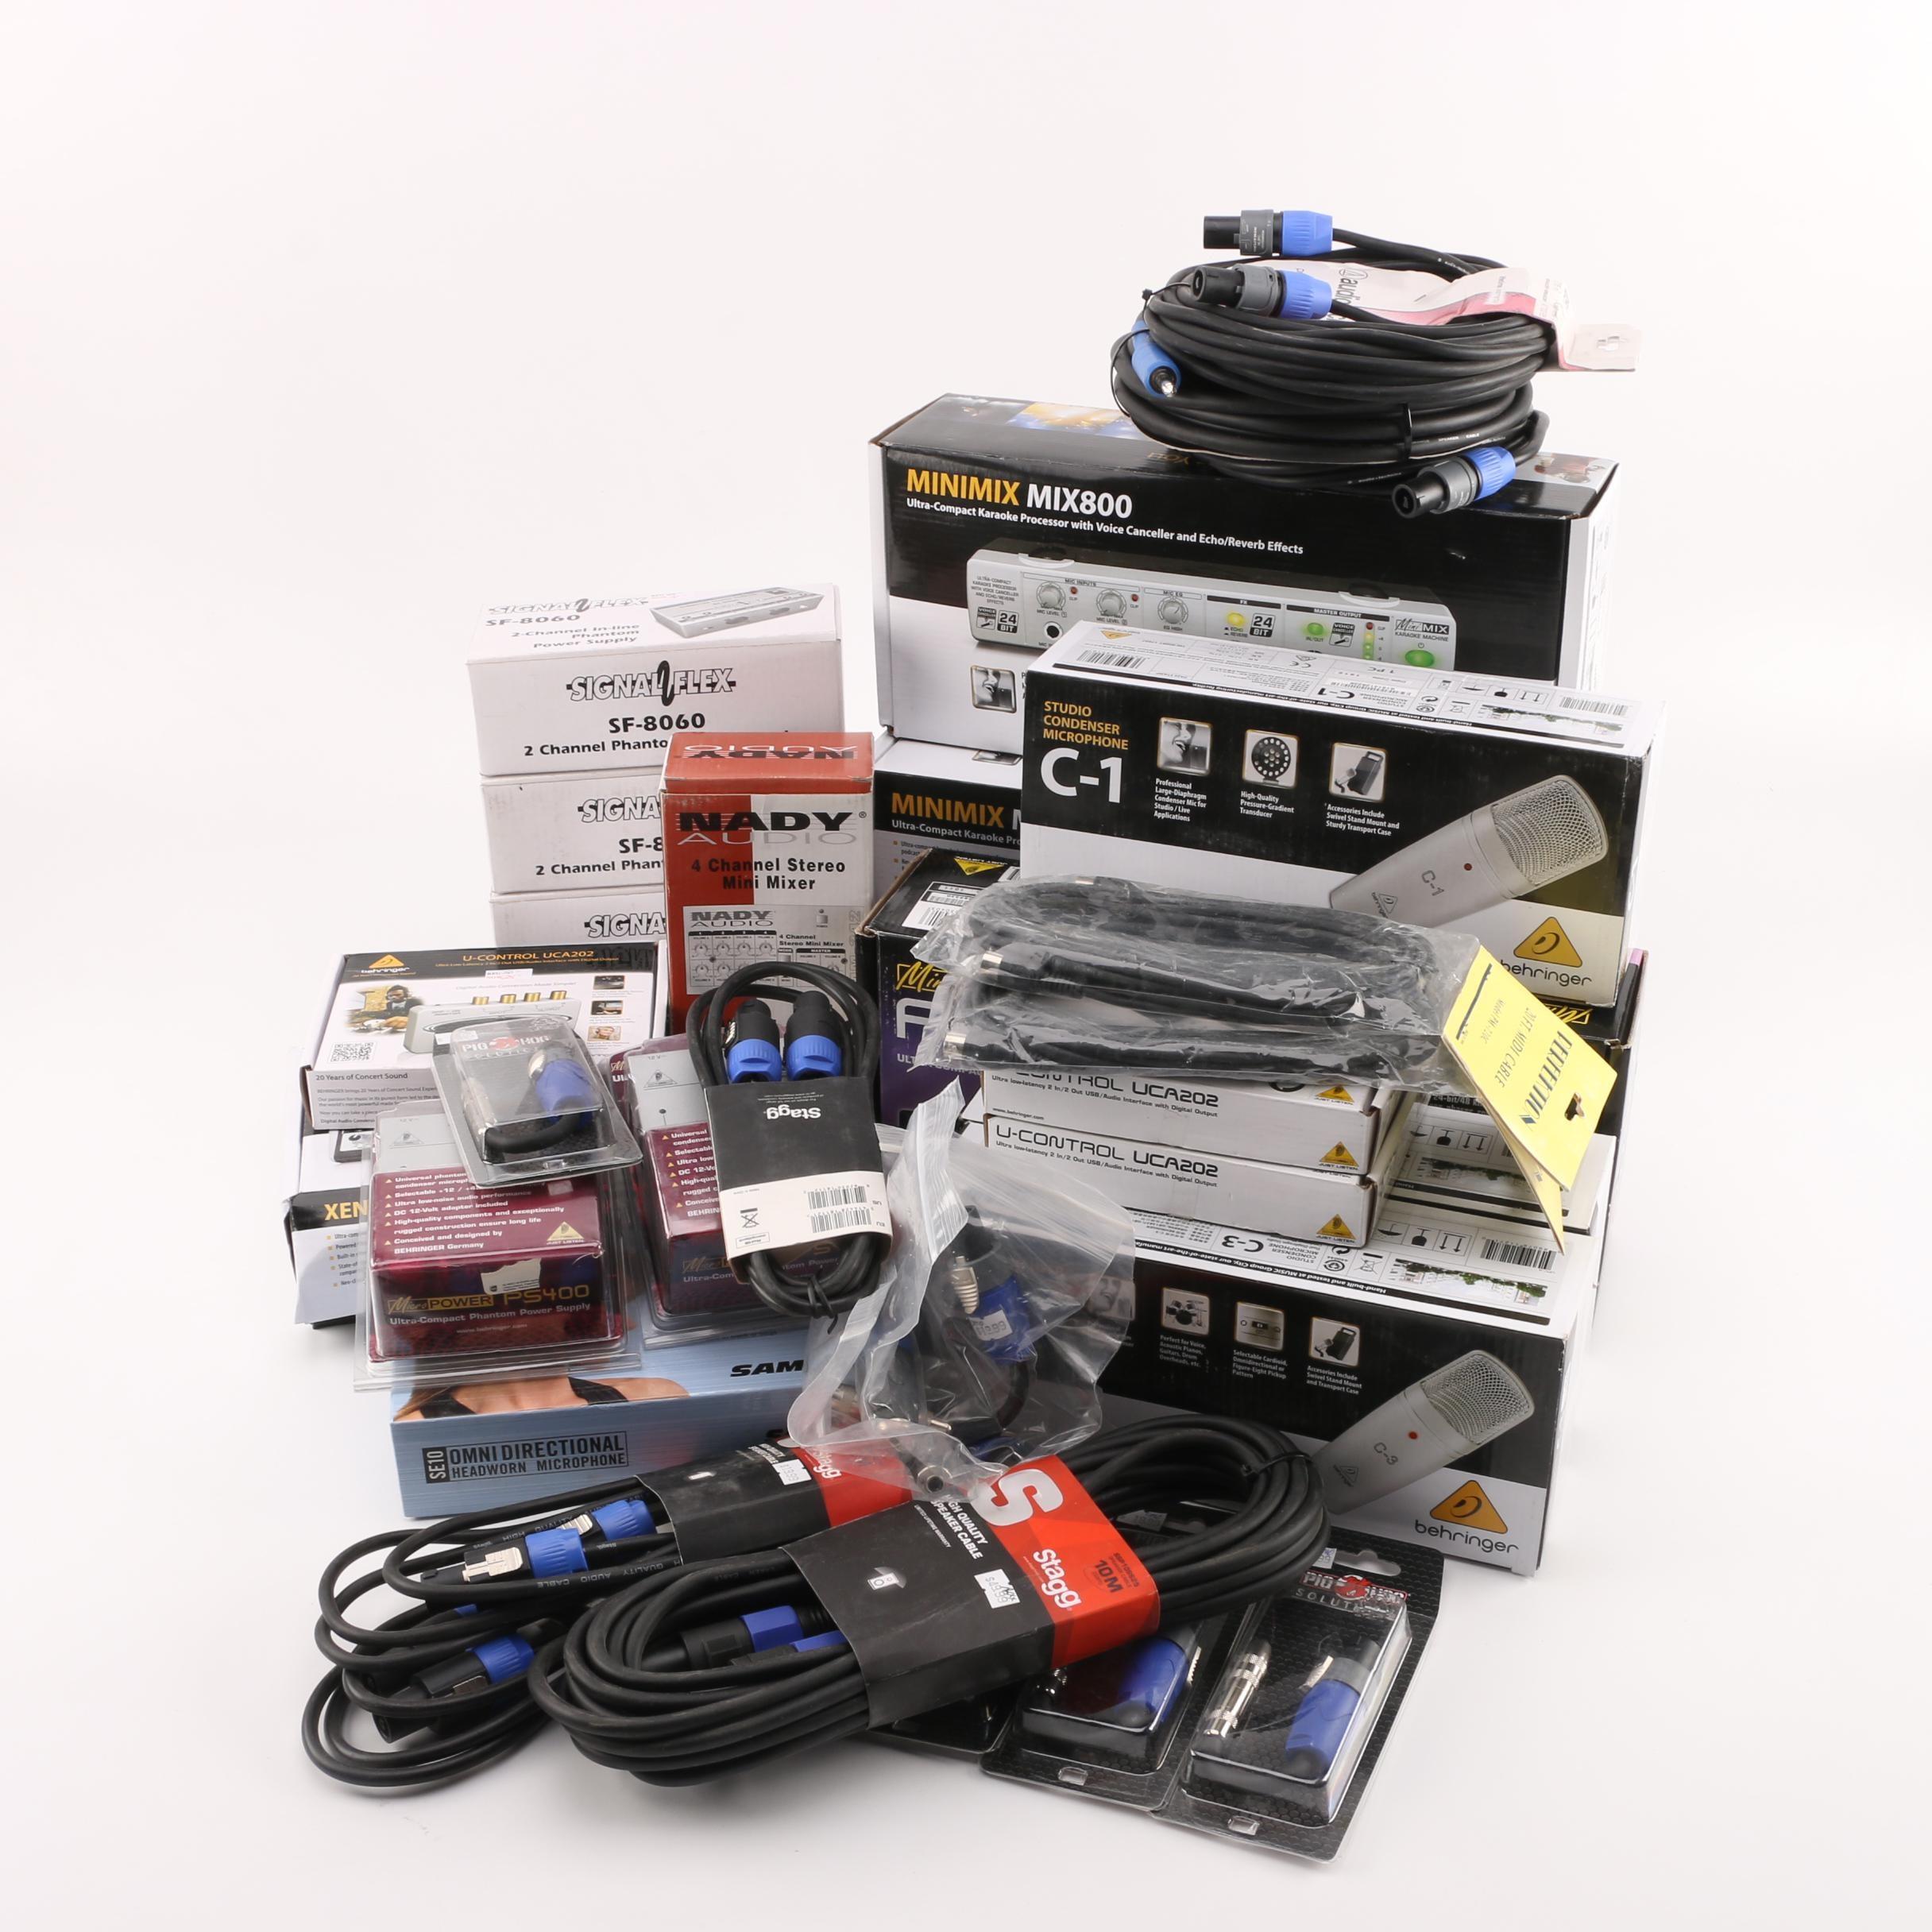 Studio Condenser Microphones, Speaker Cables, and Other Audio Equipment